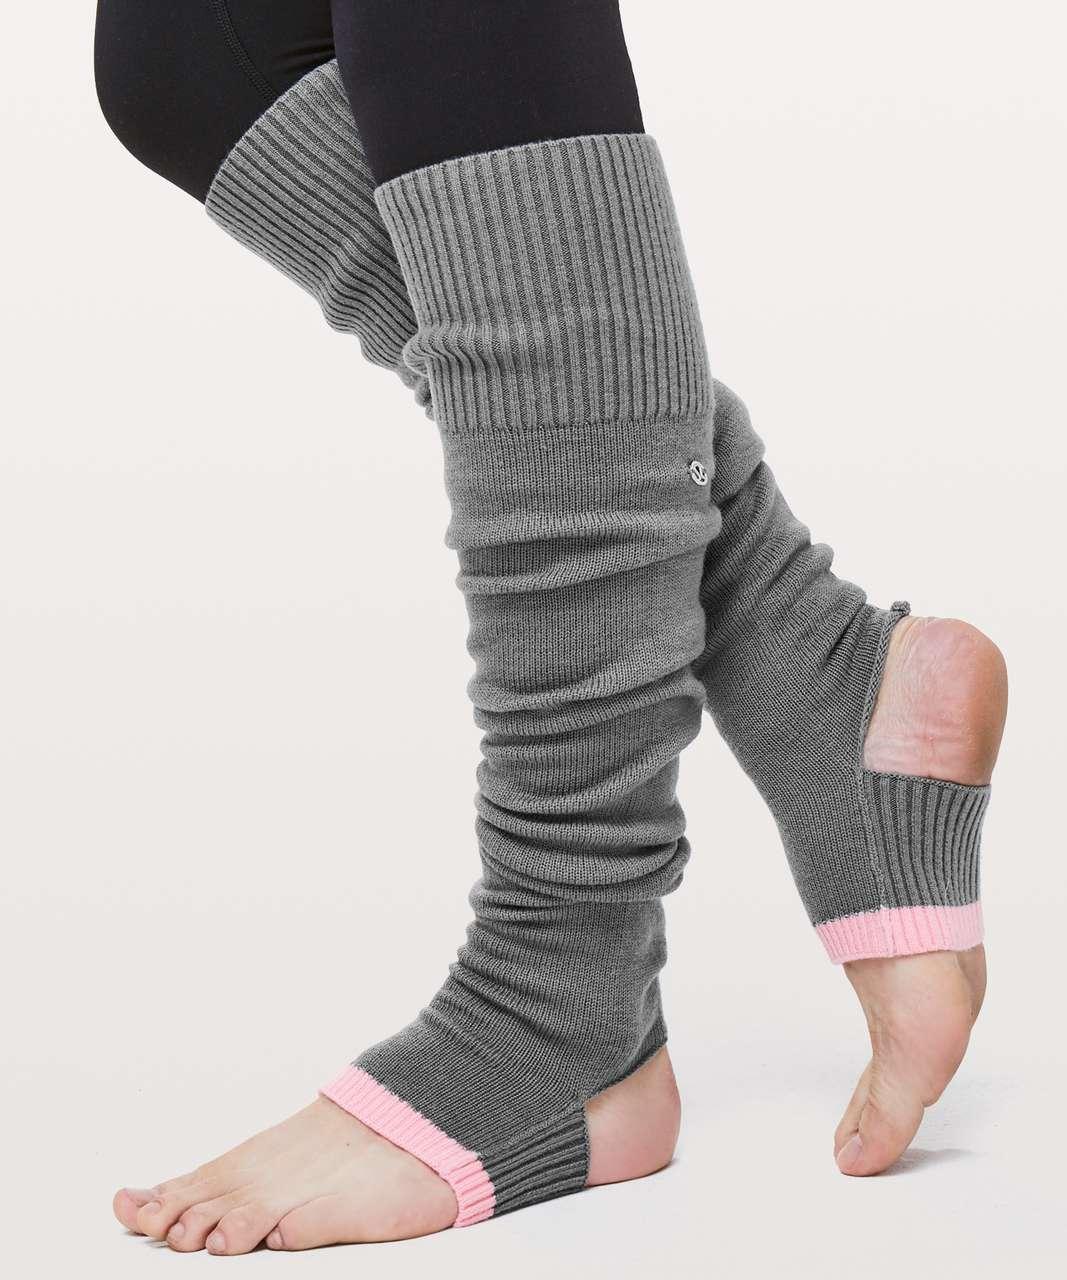 Lululemon Evolution Leg Warmers - Slate / Bleached Coral